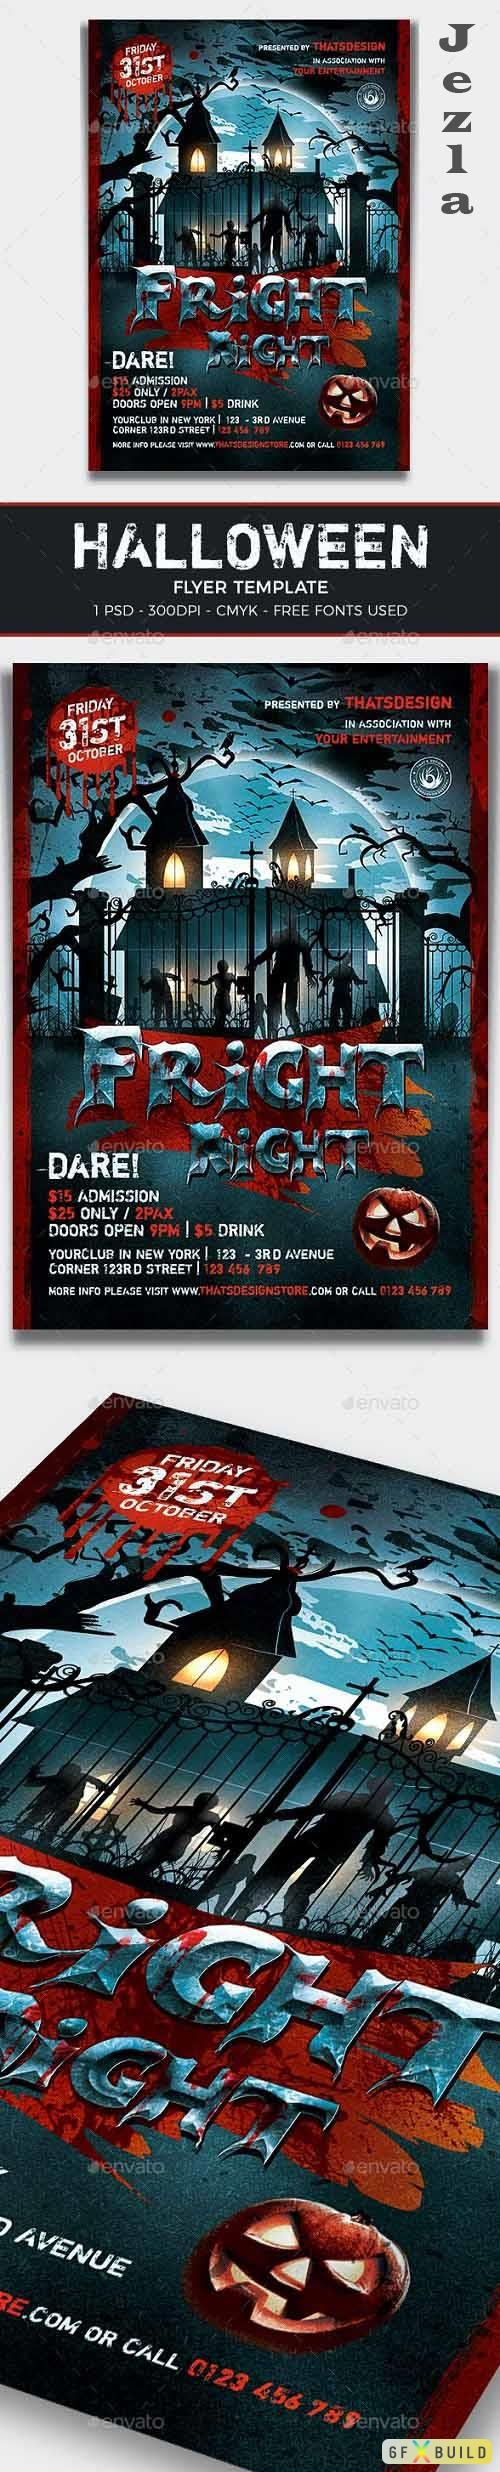 Halloween Flyer Template V17 - 12958055 - 373637